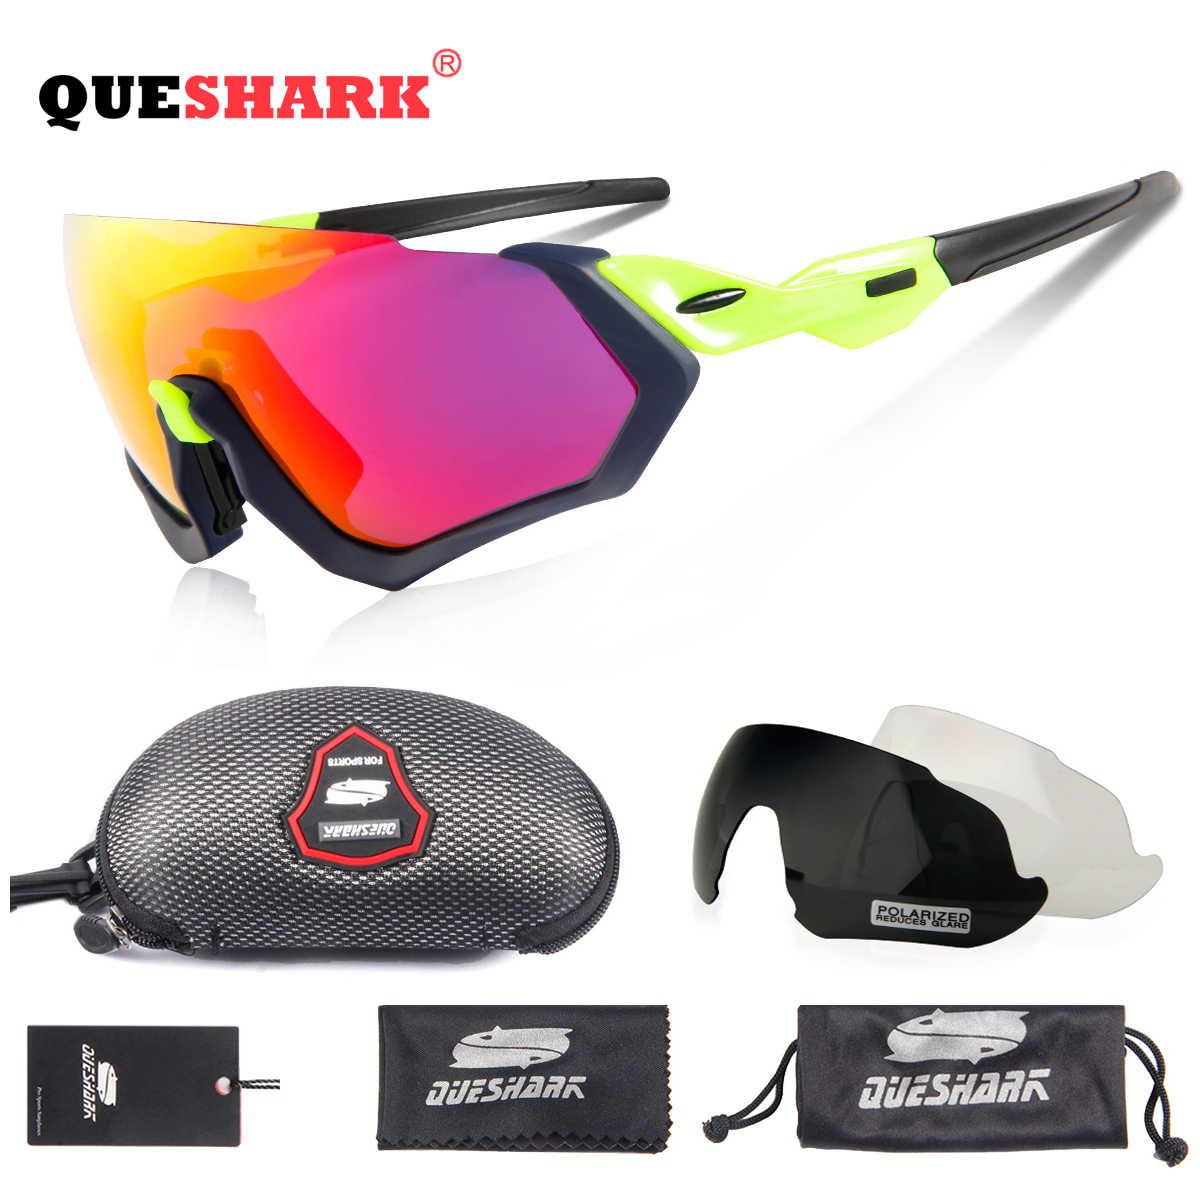 4d01e60b39a Queshark Sport Sunglasses Mtb Cycling Glasses Bike Glasses Men Women Bicycle  Goggles Cycling Eyewear 3 Lens